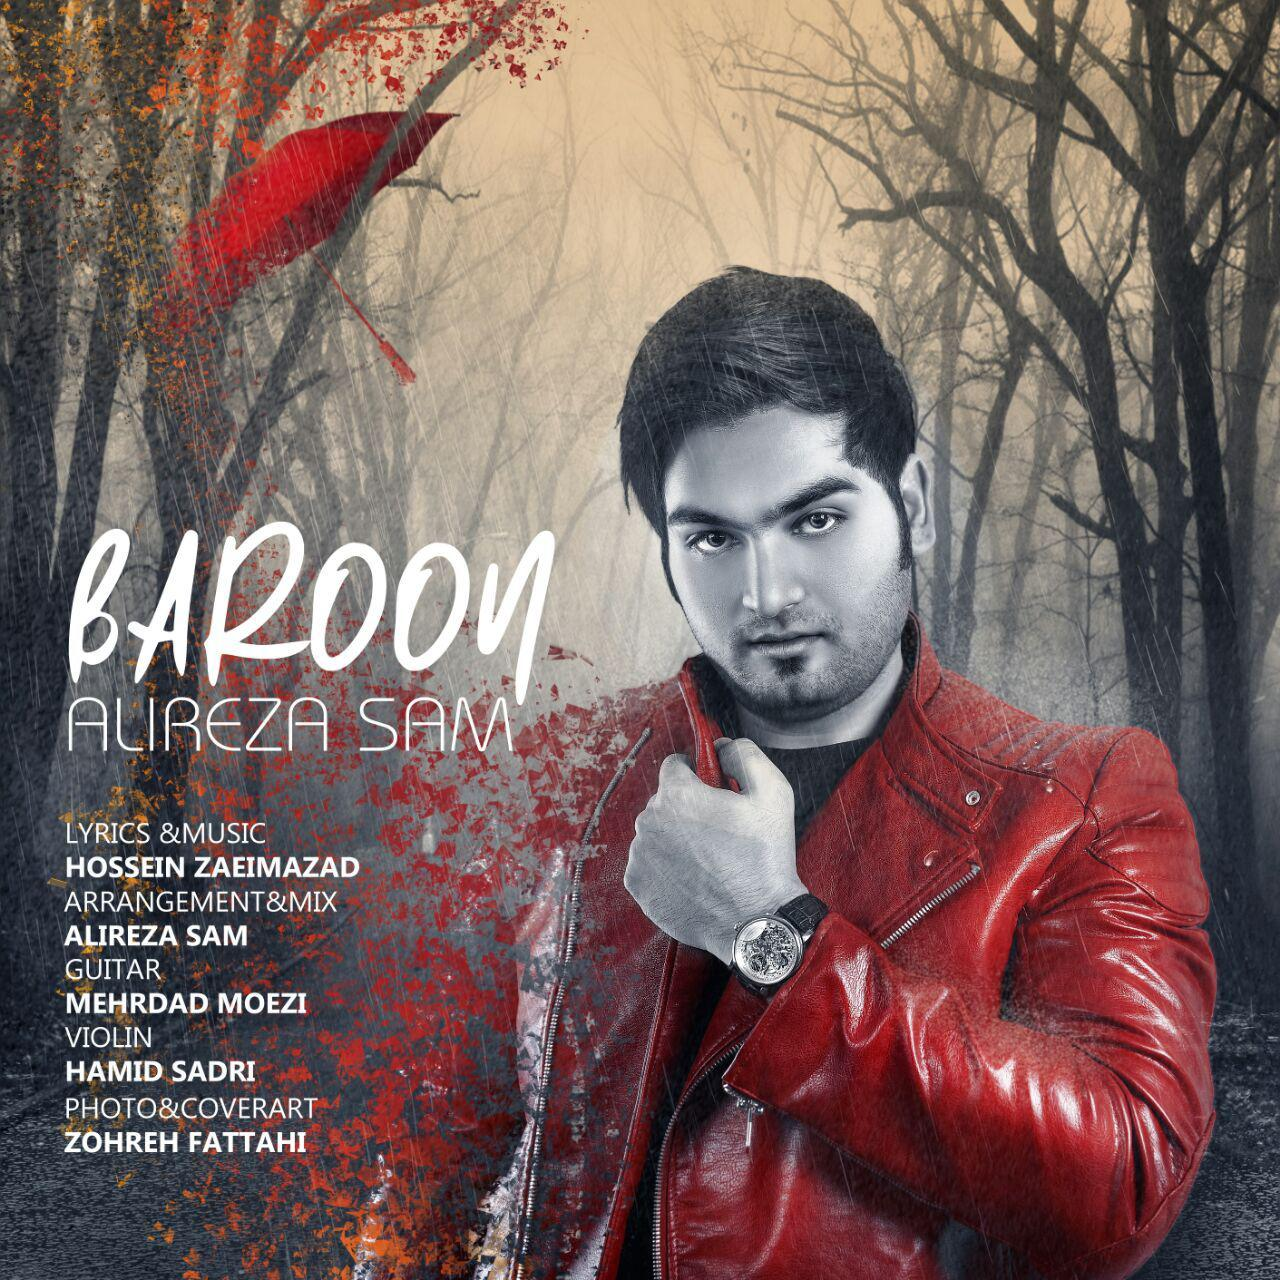 Alireza Sam – Baroon